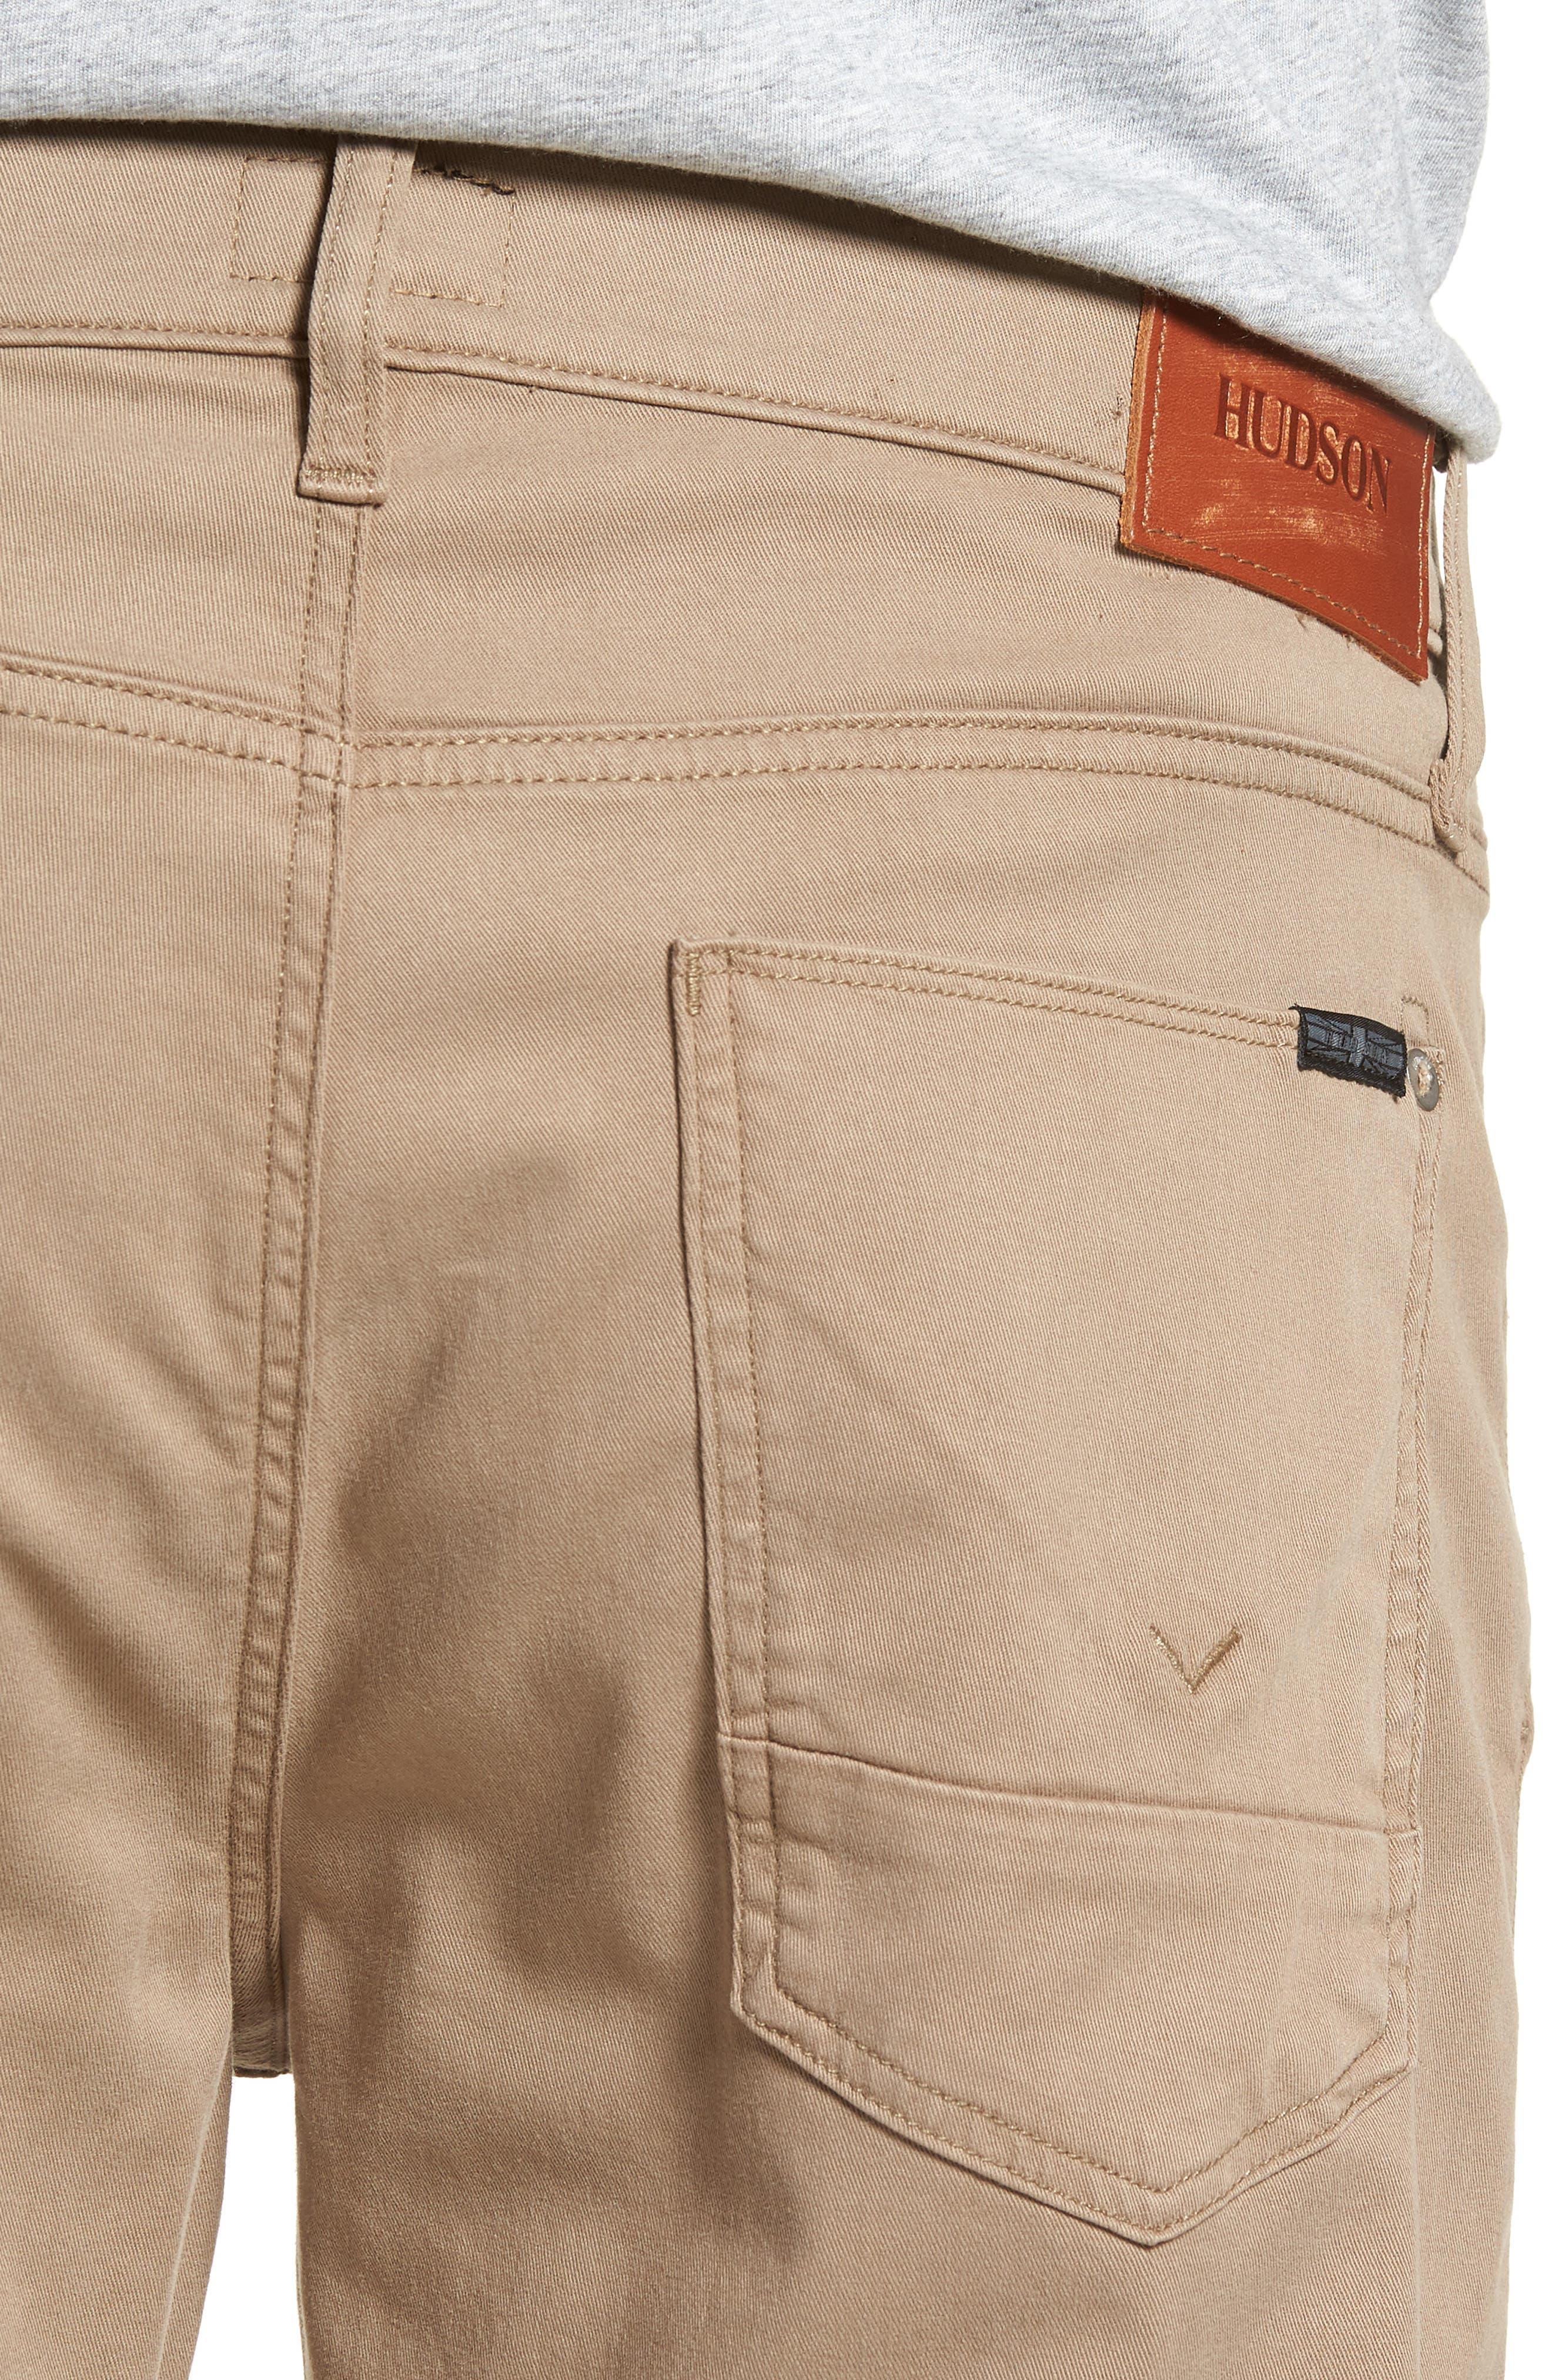 Blake Slim Fit Jeans,                             Alternate thumbnail 4, color,                             Sandman